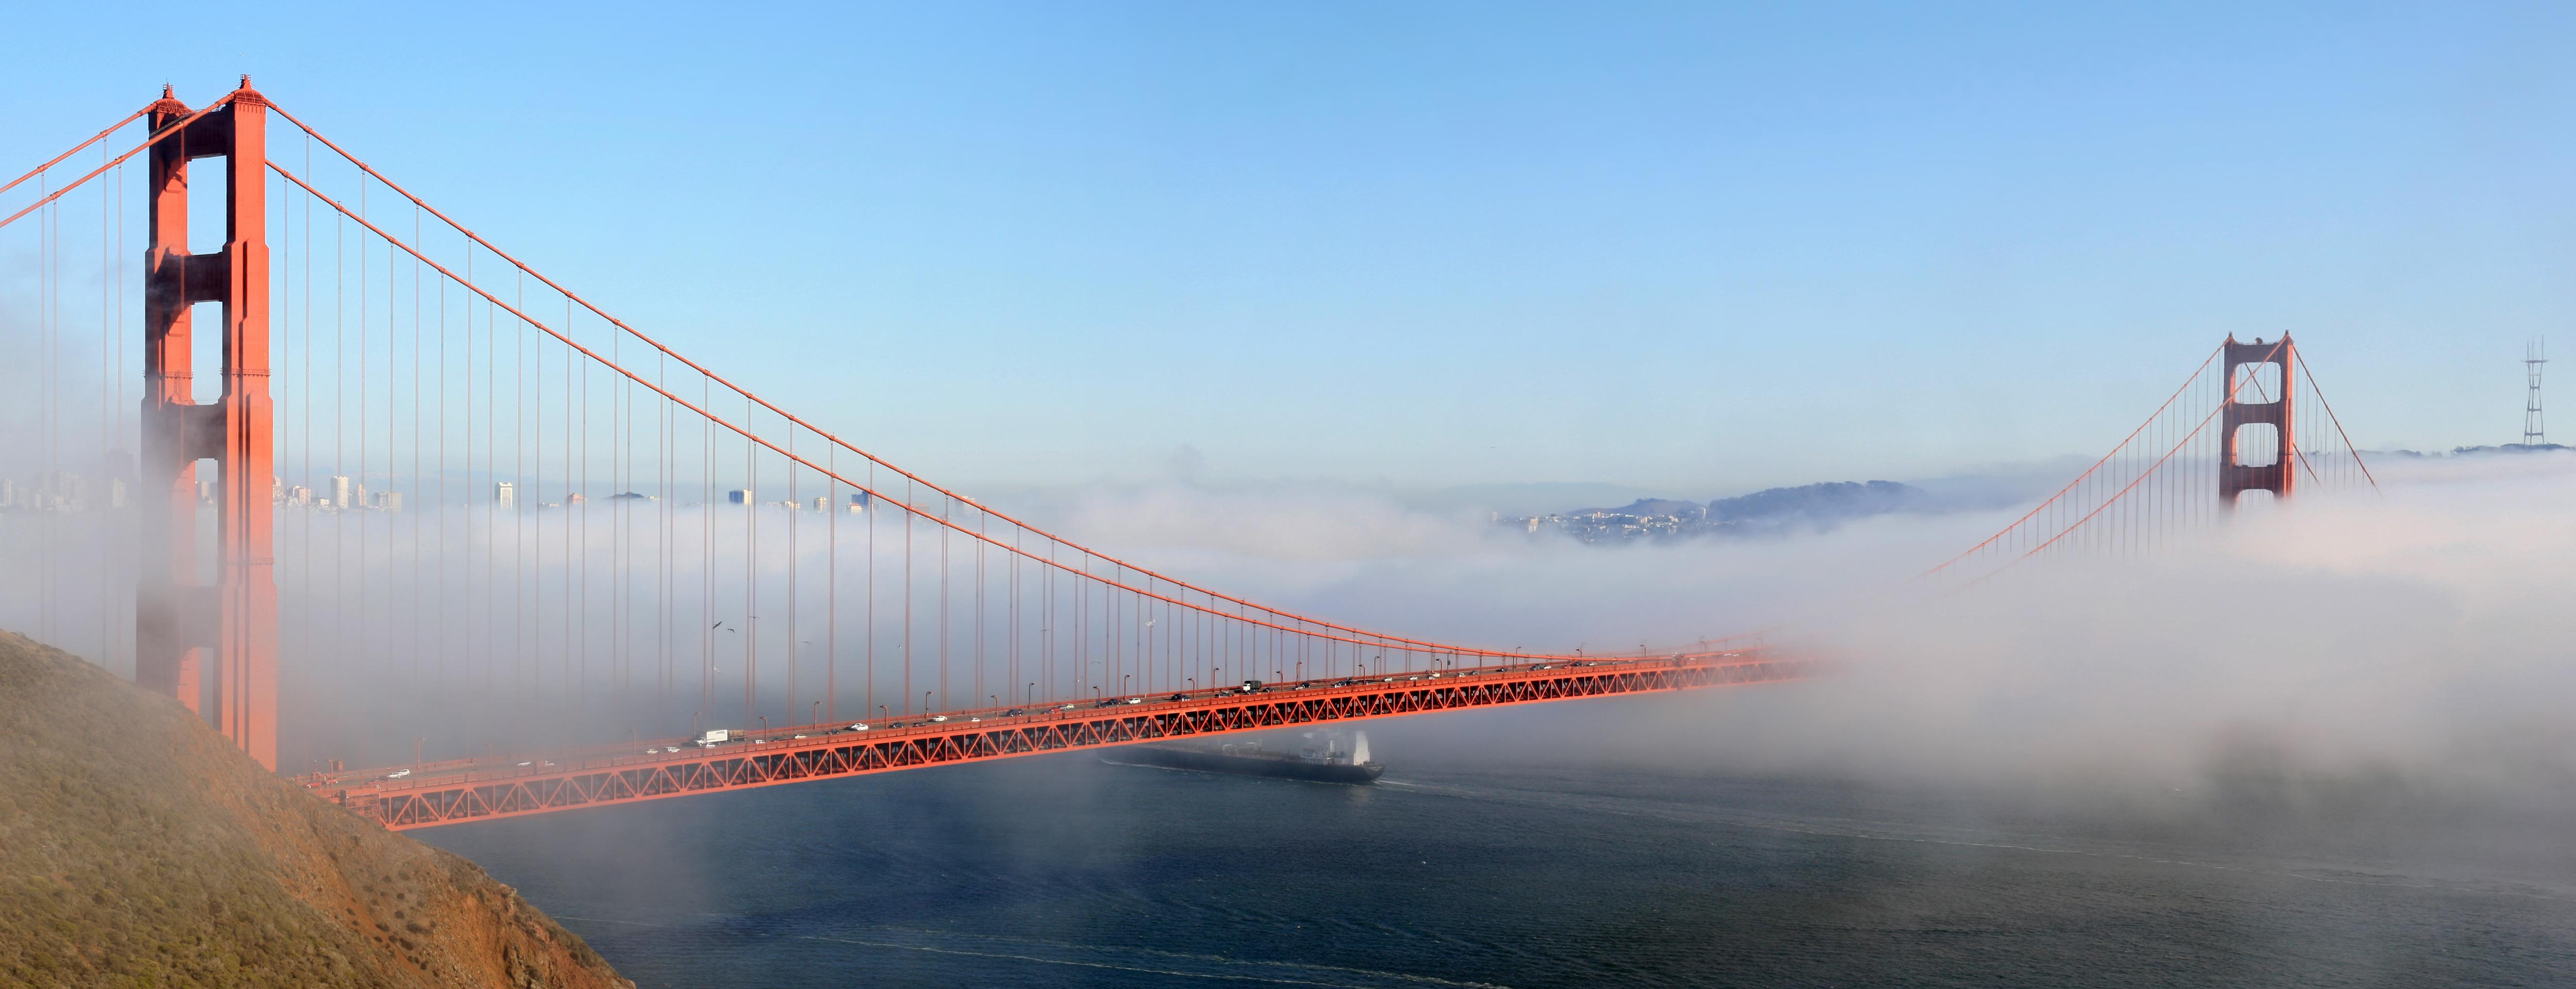 Shades of Blue at Golden Gate Bridge, San Francisco, CA